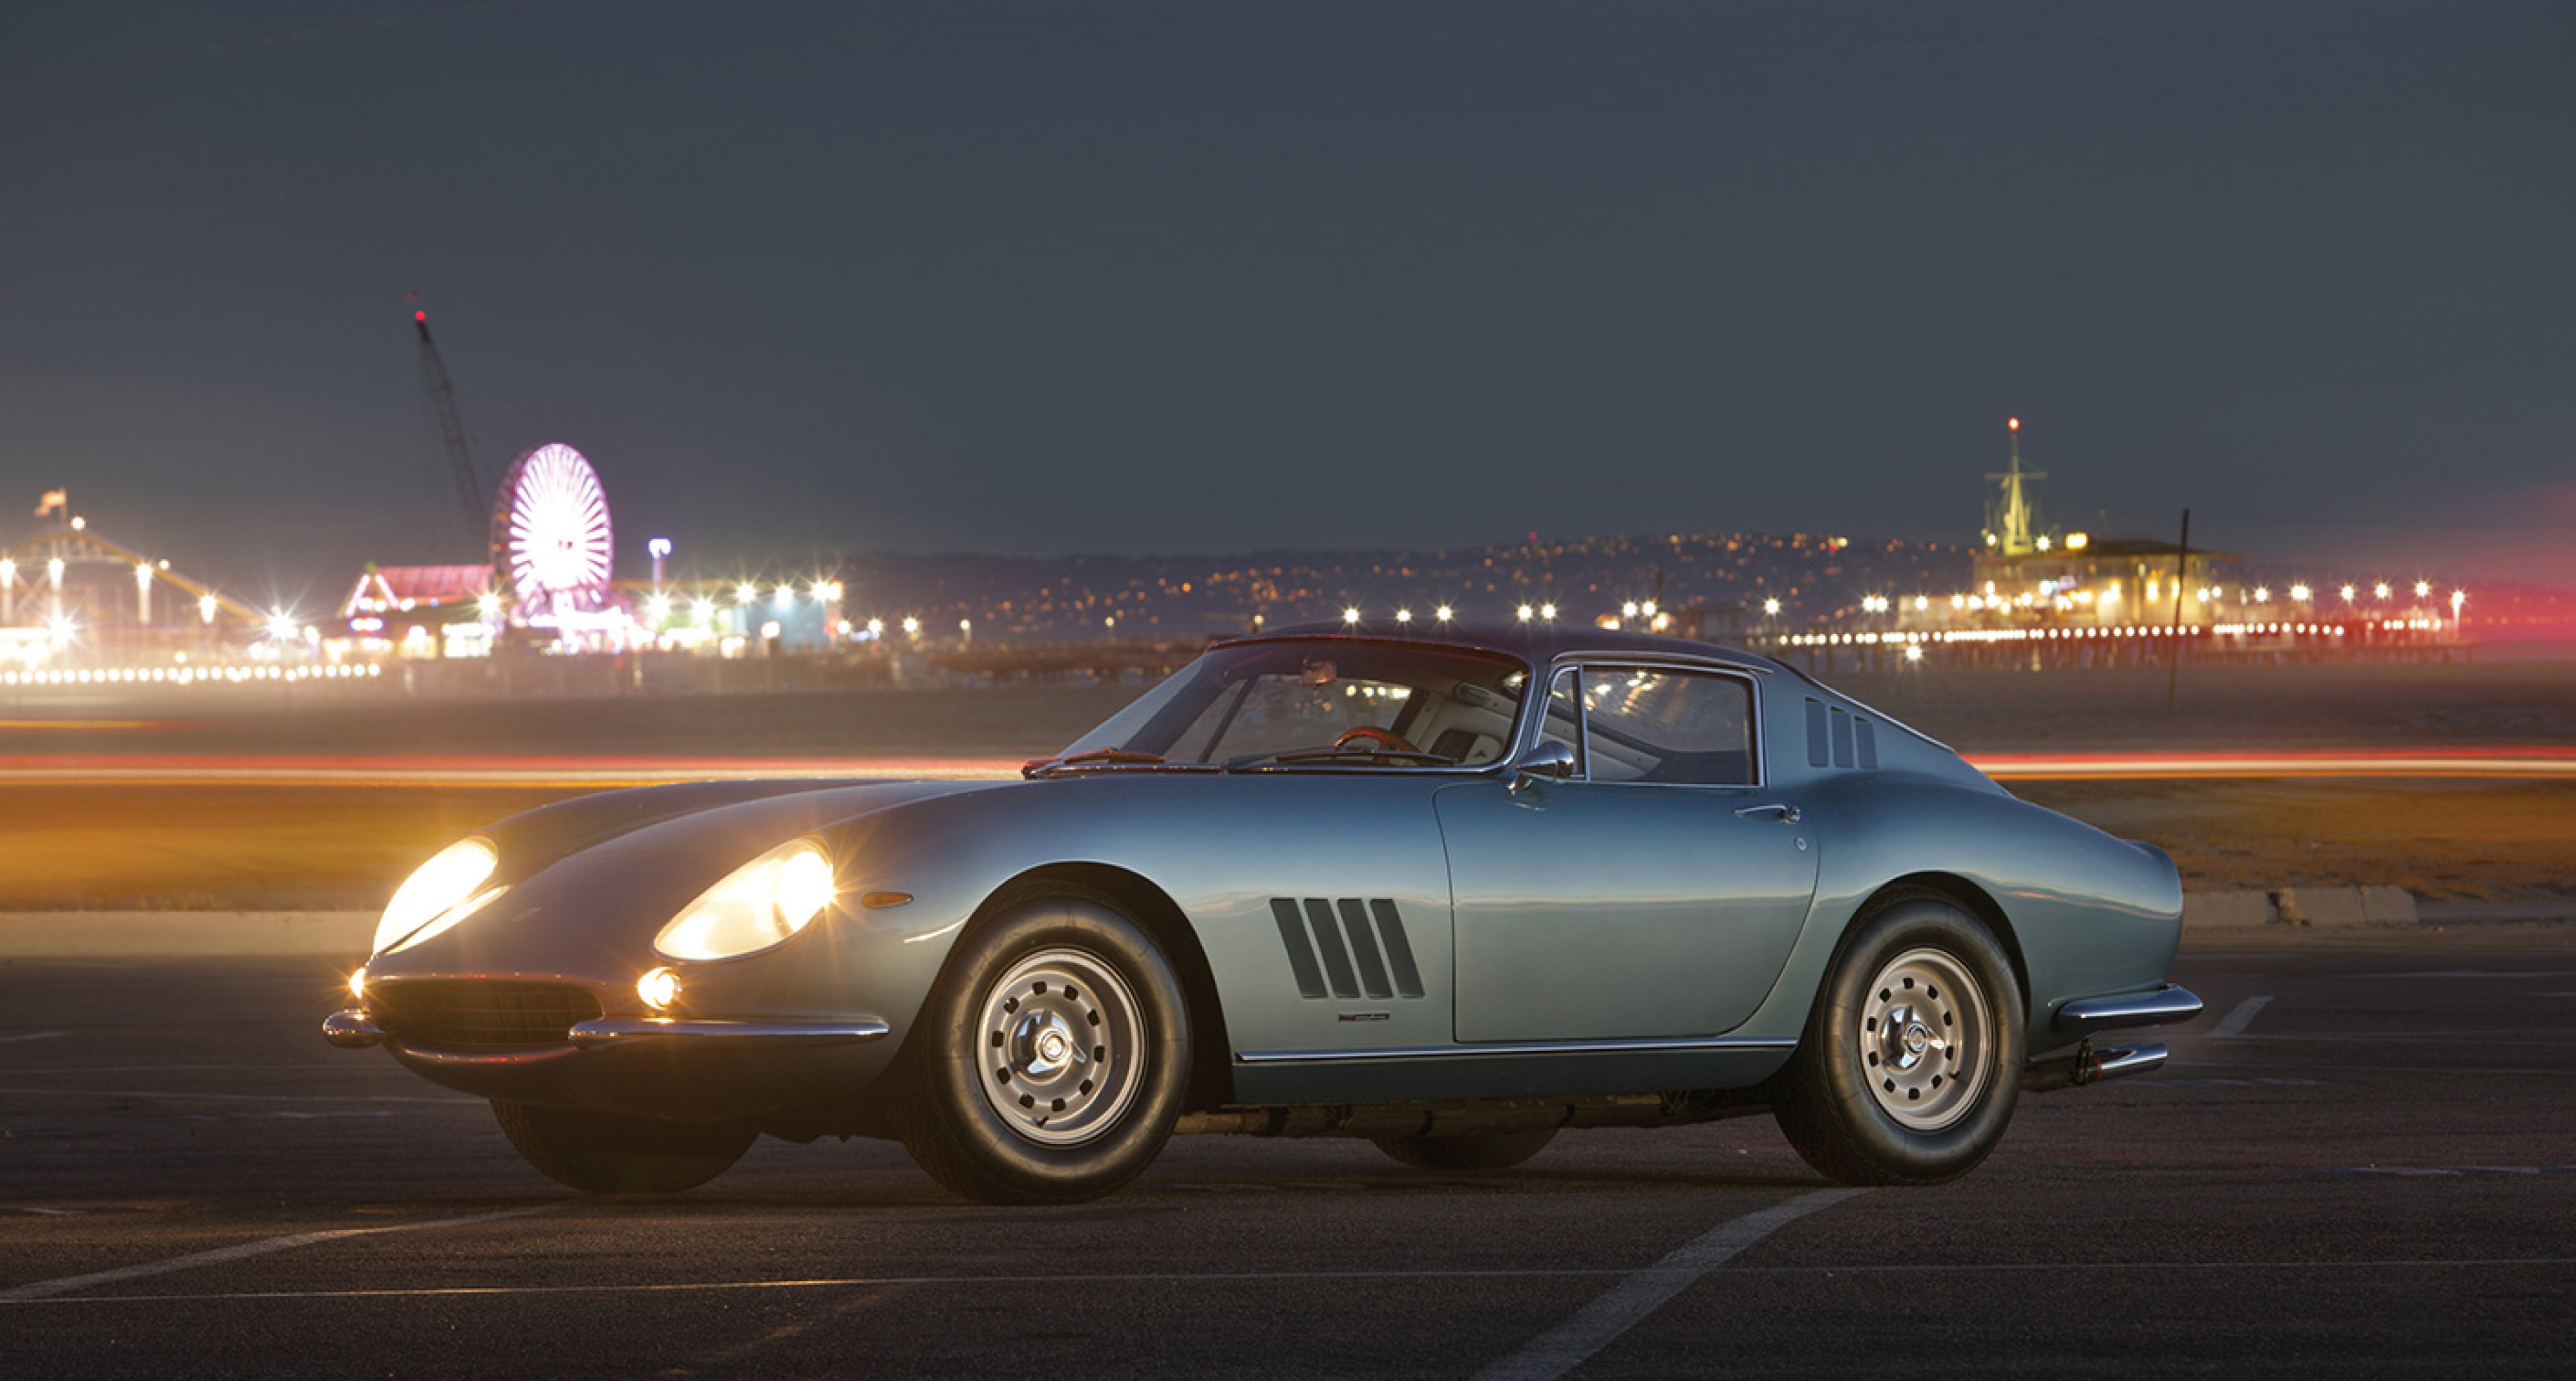 1966 Ferrari 275 GTB sold by RM for $1,815,000